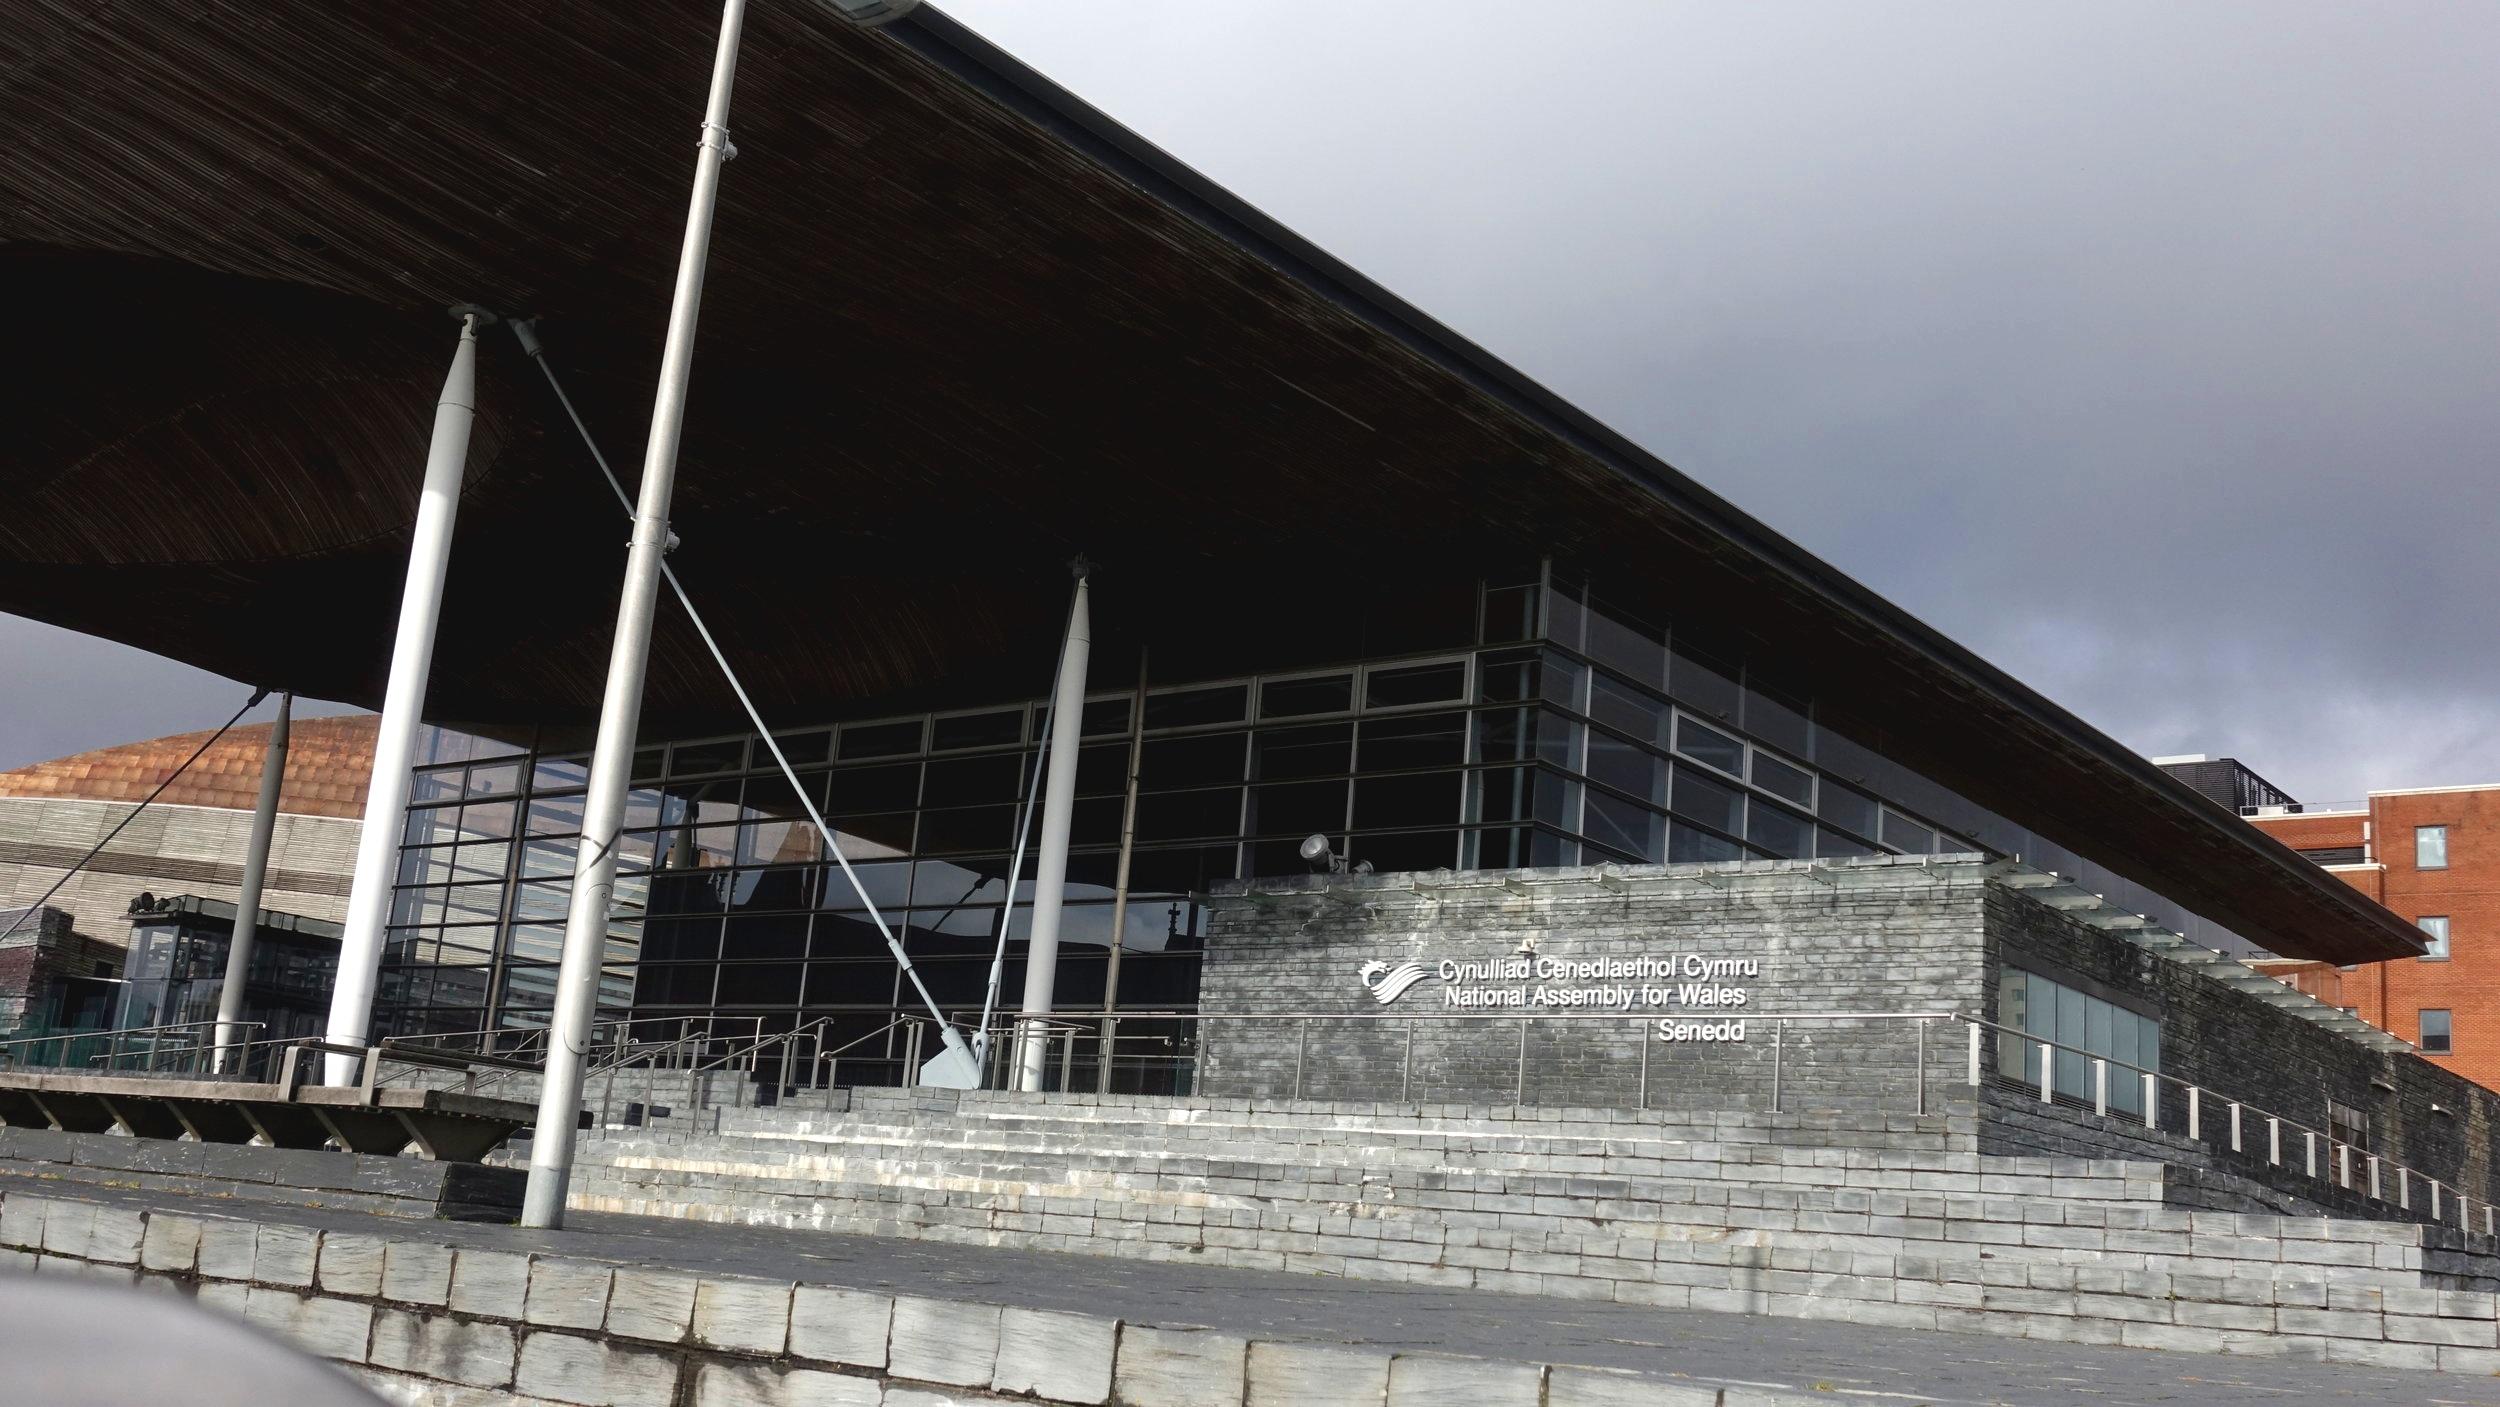 Exhibition venue - Senedd, Cardiff Bay. Image © Brian Carroll